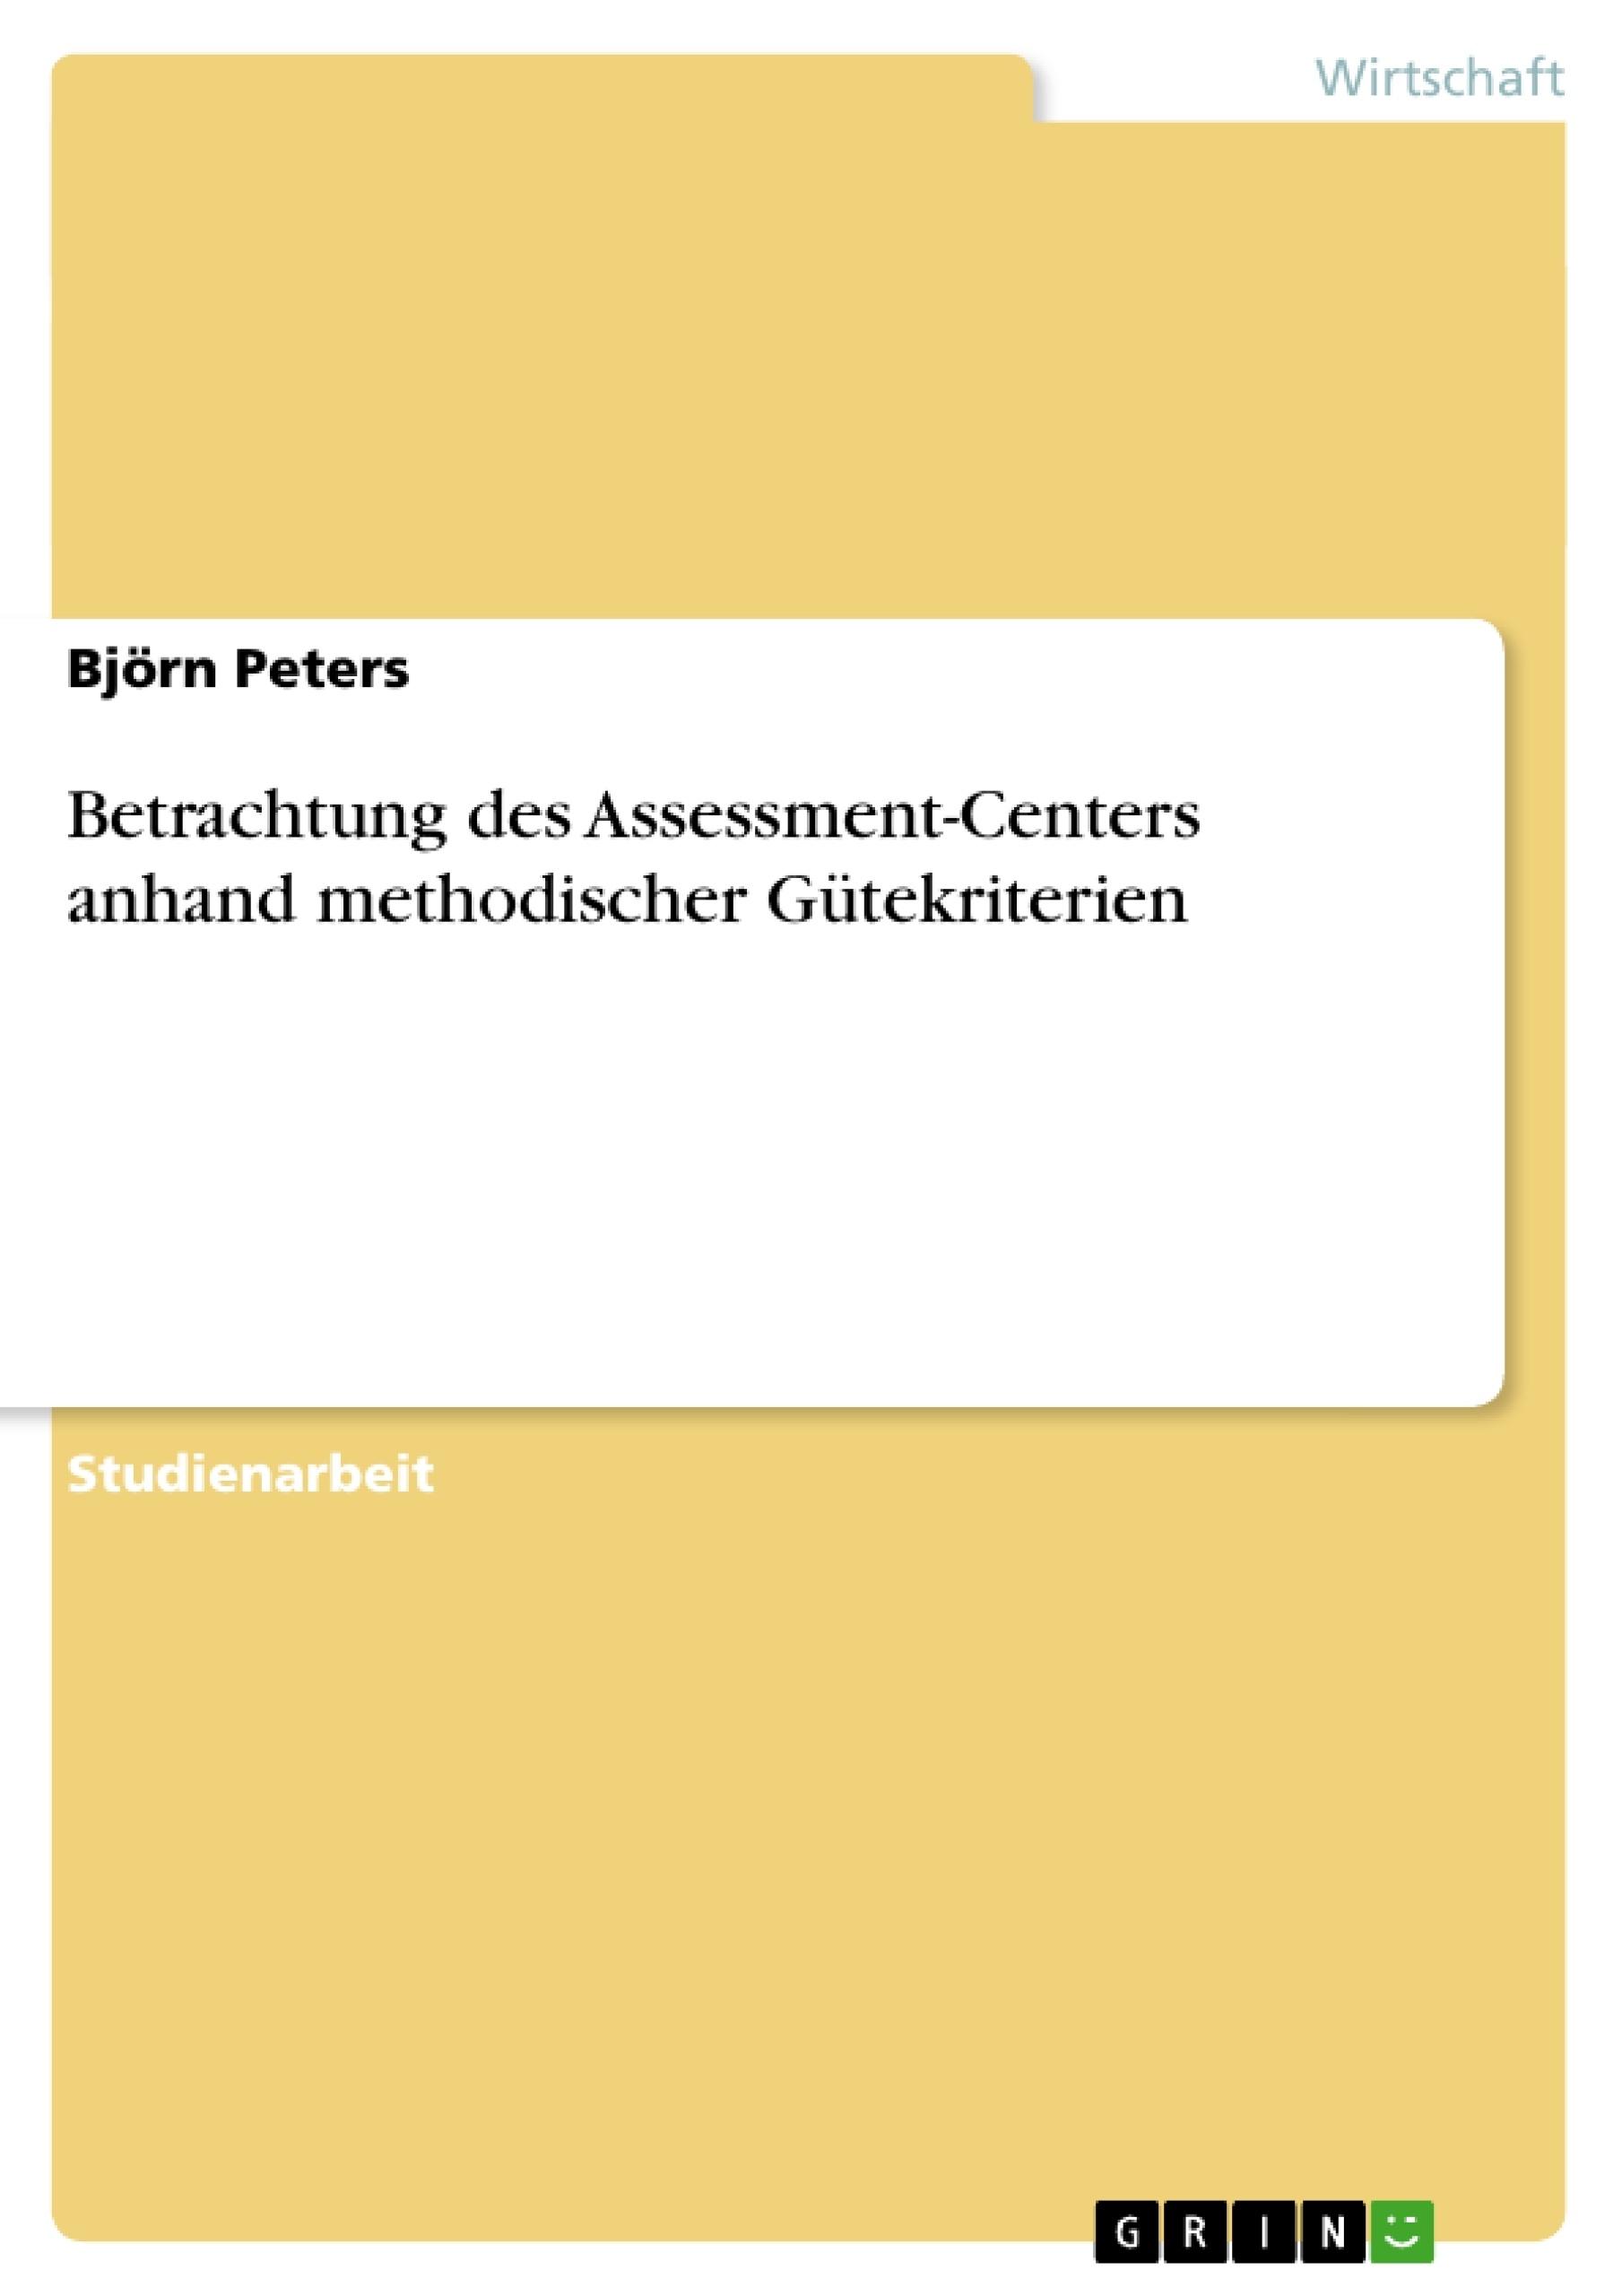 Titel: Betrachtung des Assessment-Centers anhand methodischer Gütekriterien